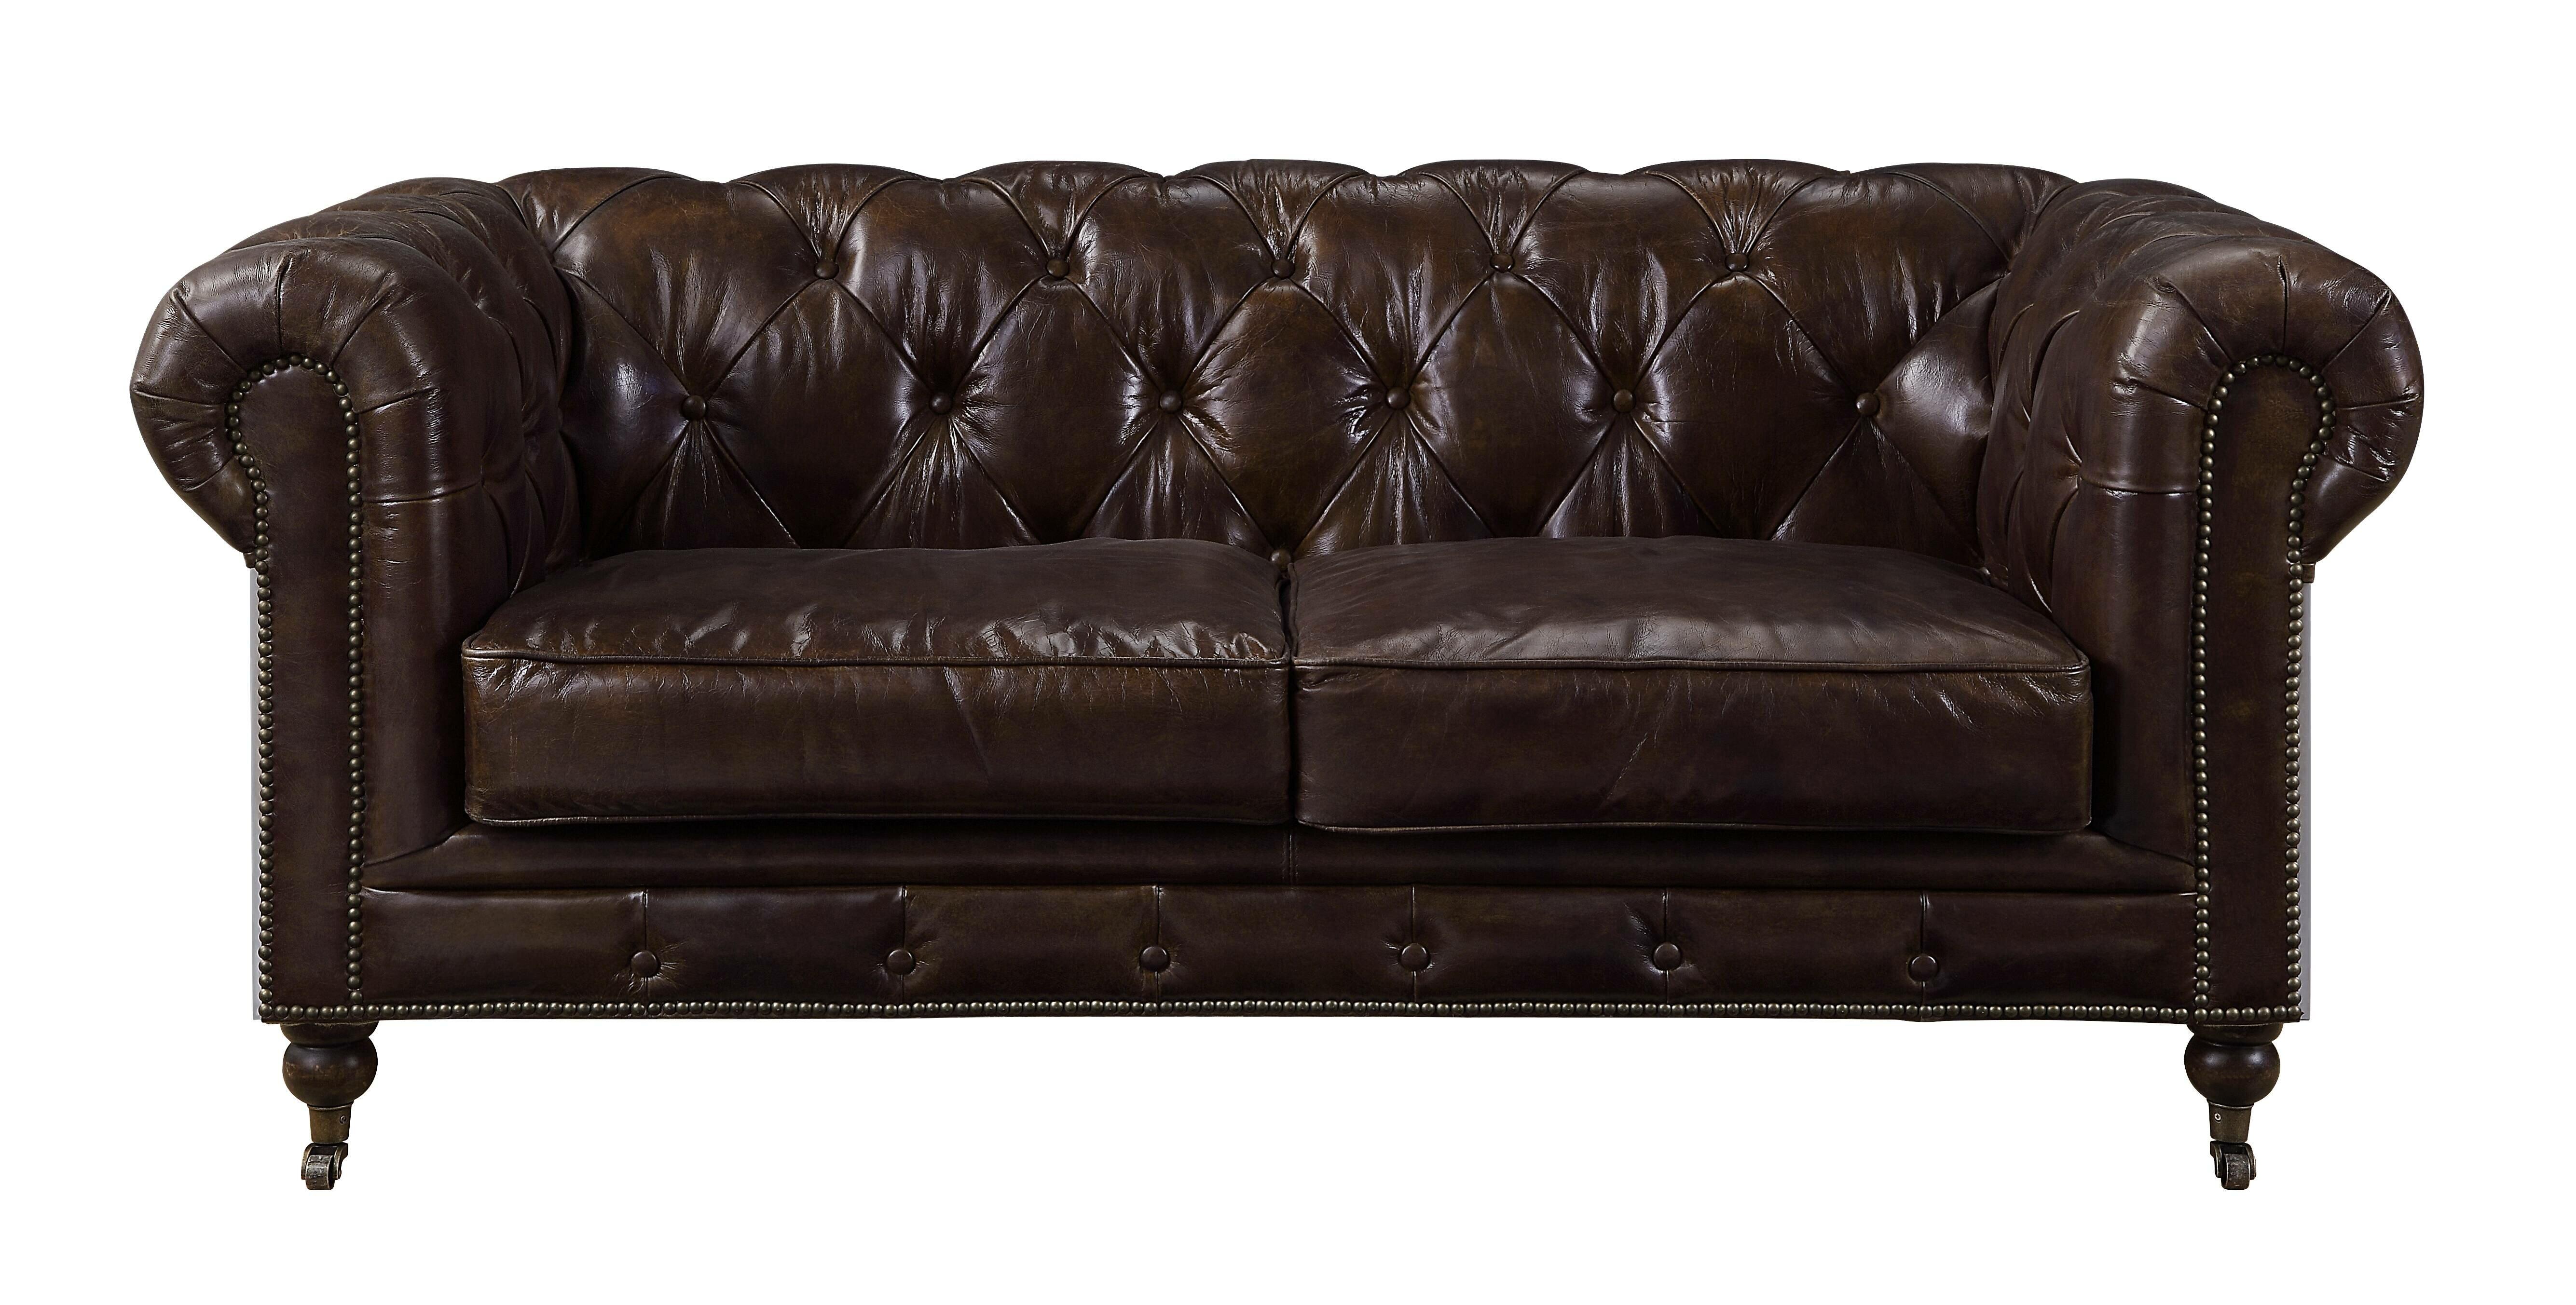 Williston Forge Hayner Genuine Leather Chesterfield 72 Rolled Arm Loveseat Wayfair